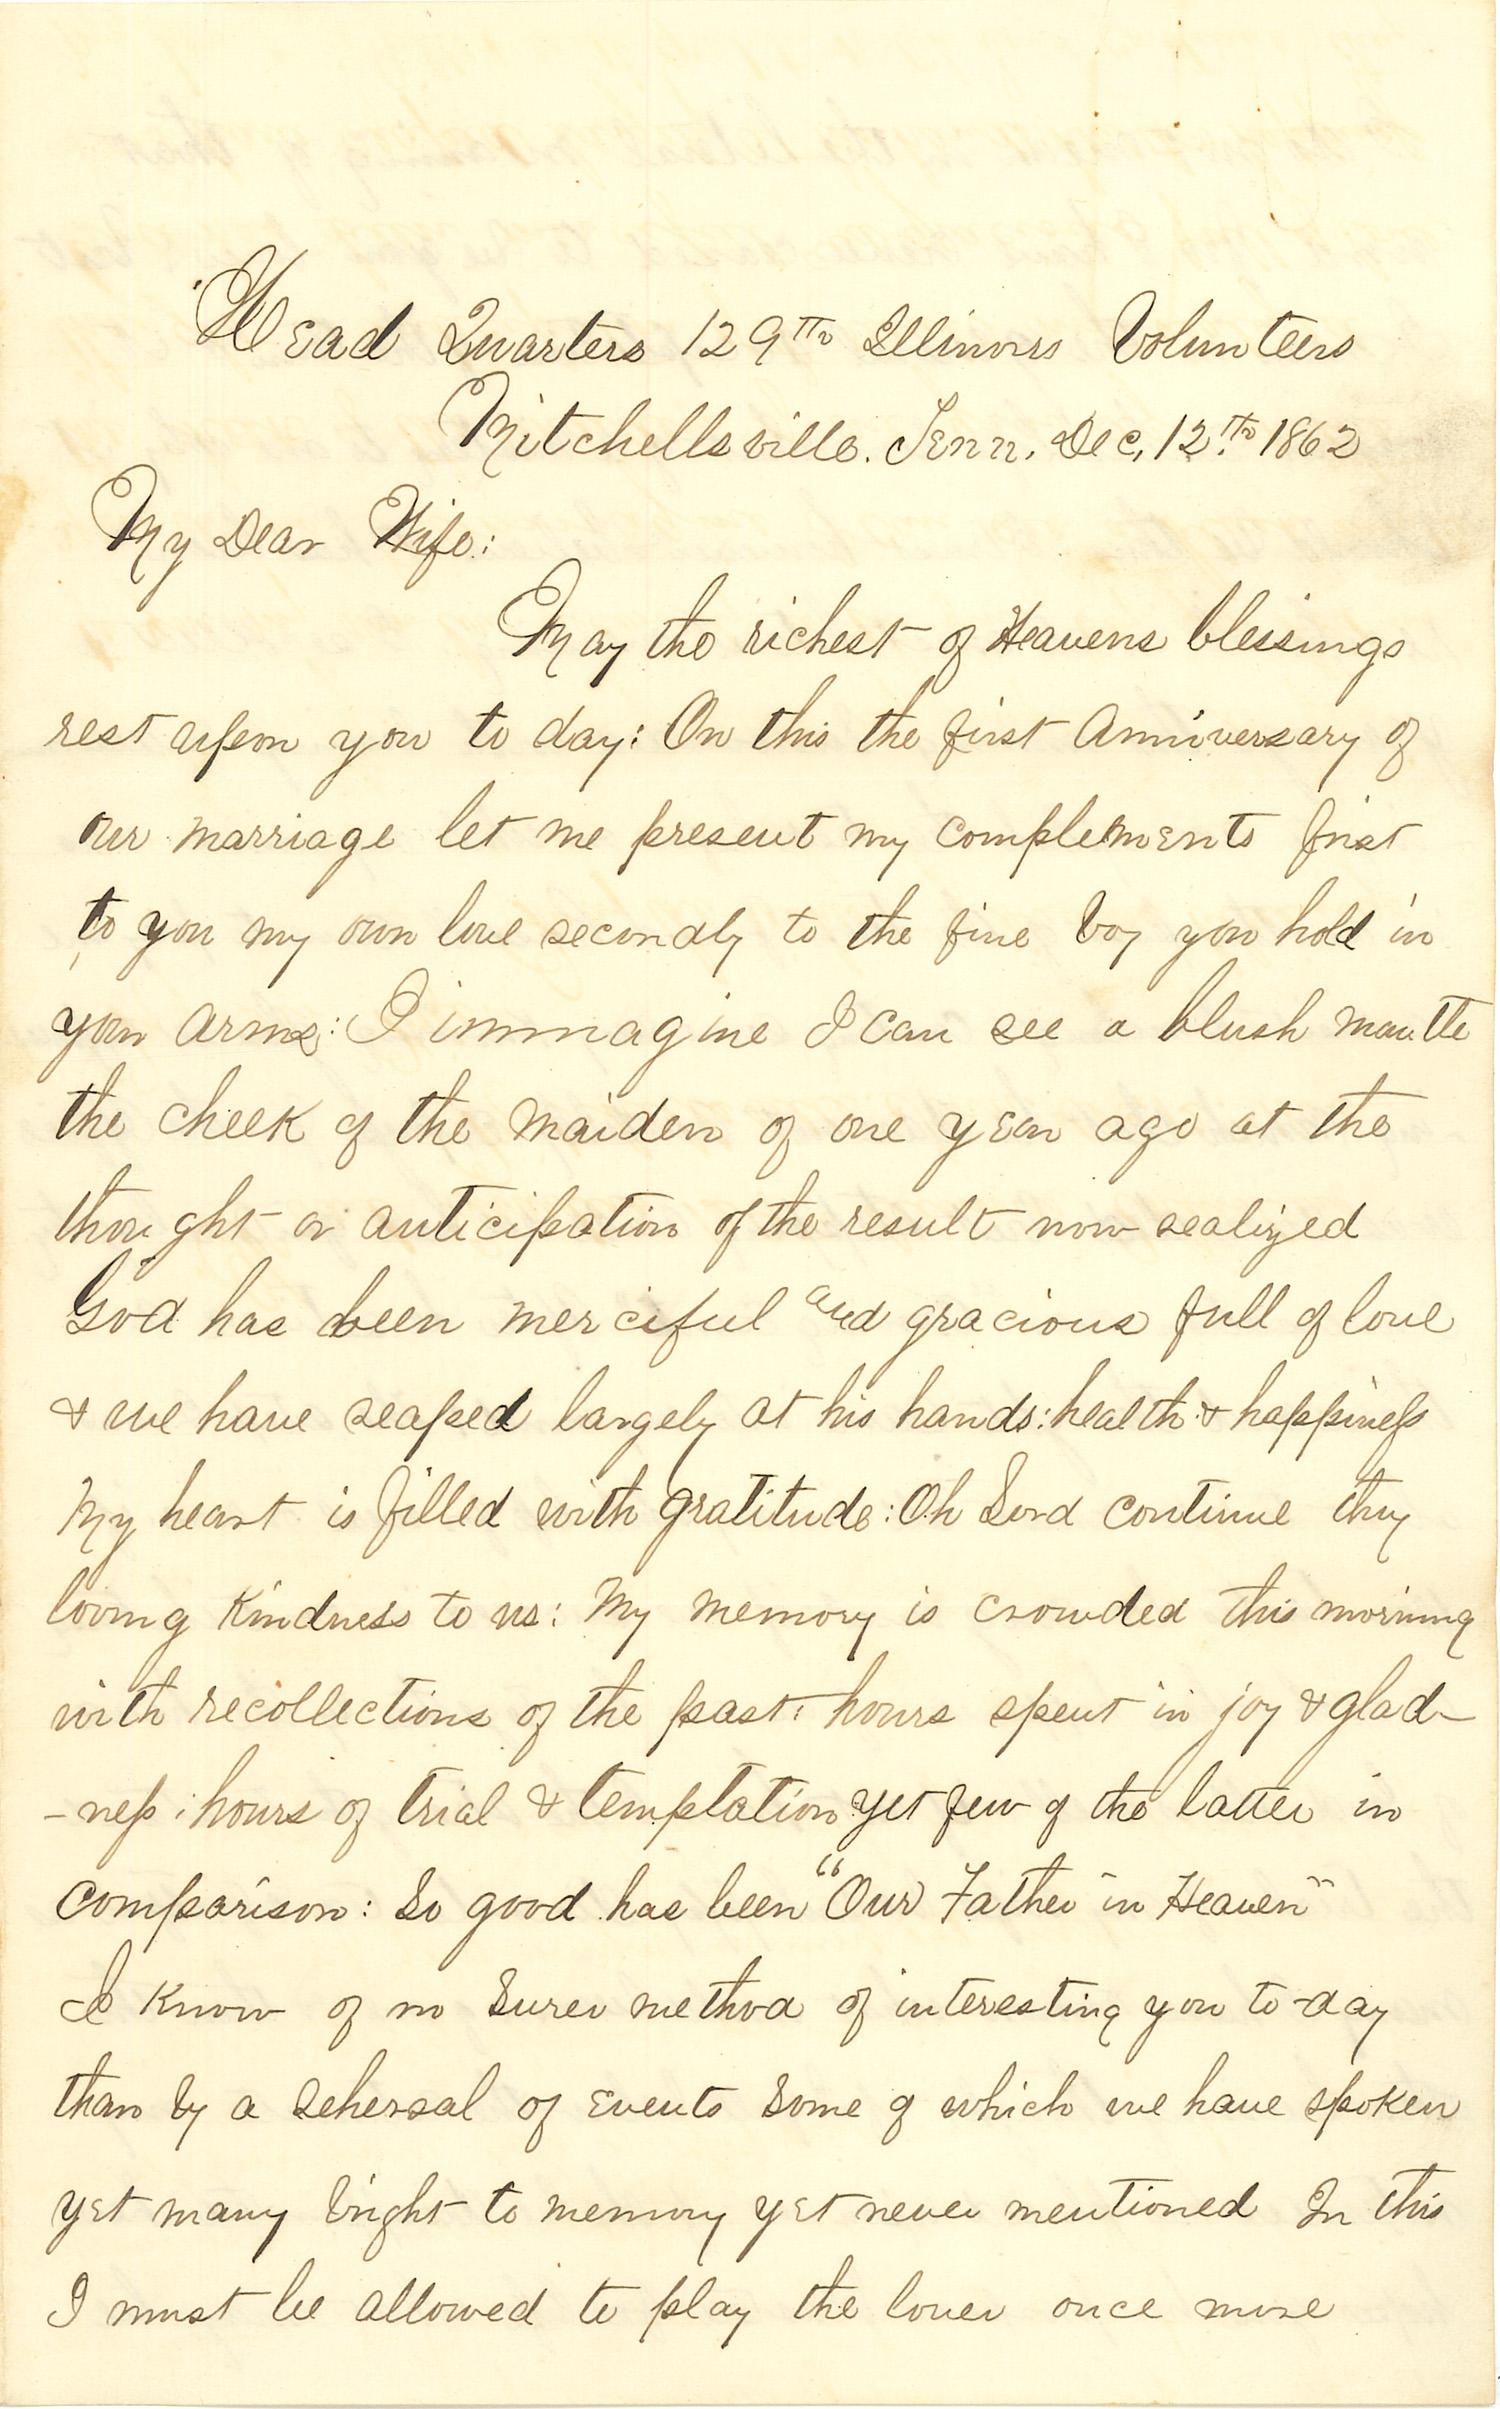 Joseph Culver Letter, December 12, 1862, Page 1